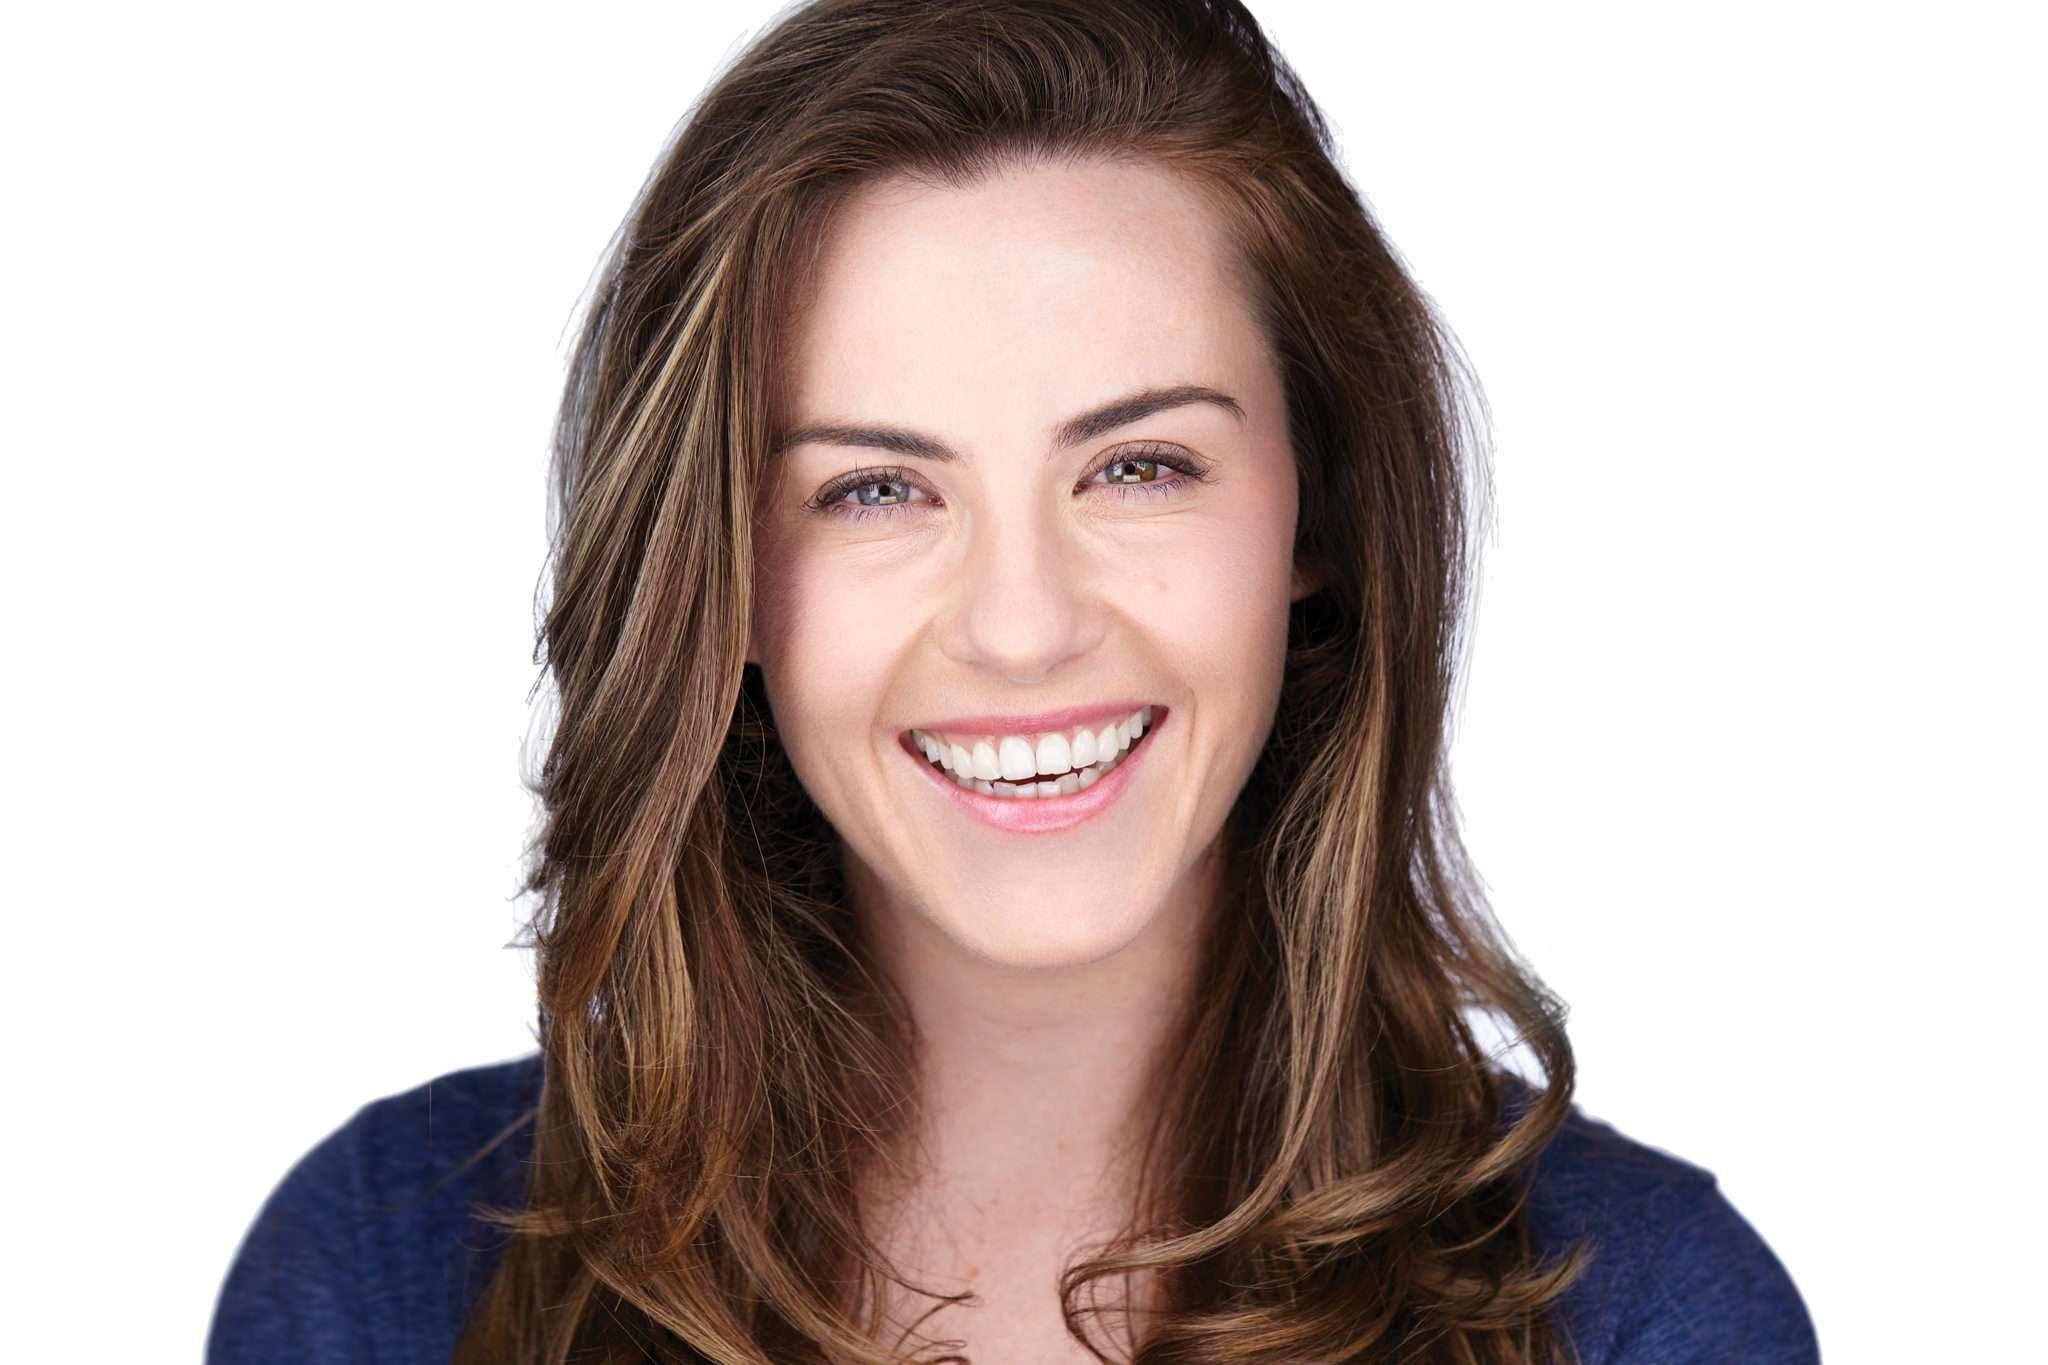 MichelleRicketts-Sydney-Headshots-Daniel-Sommer-Photography.jpg